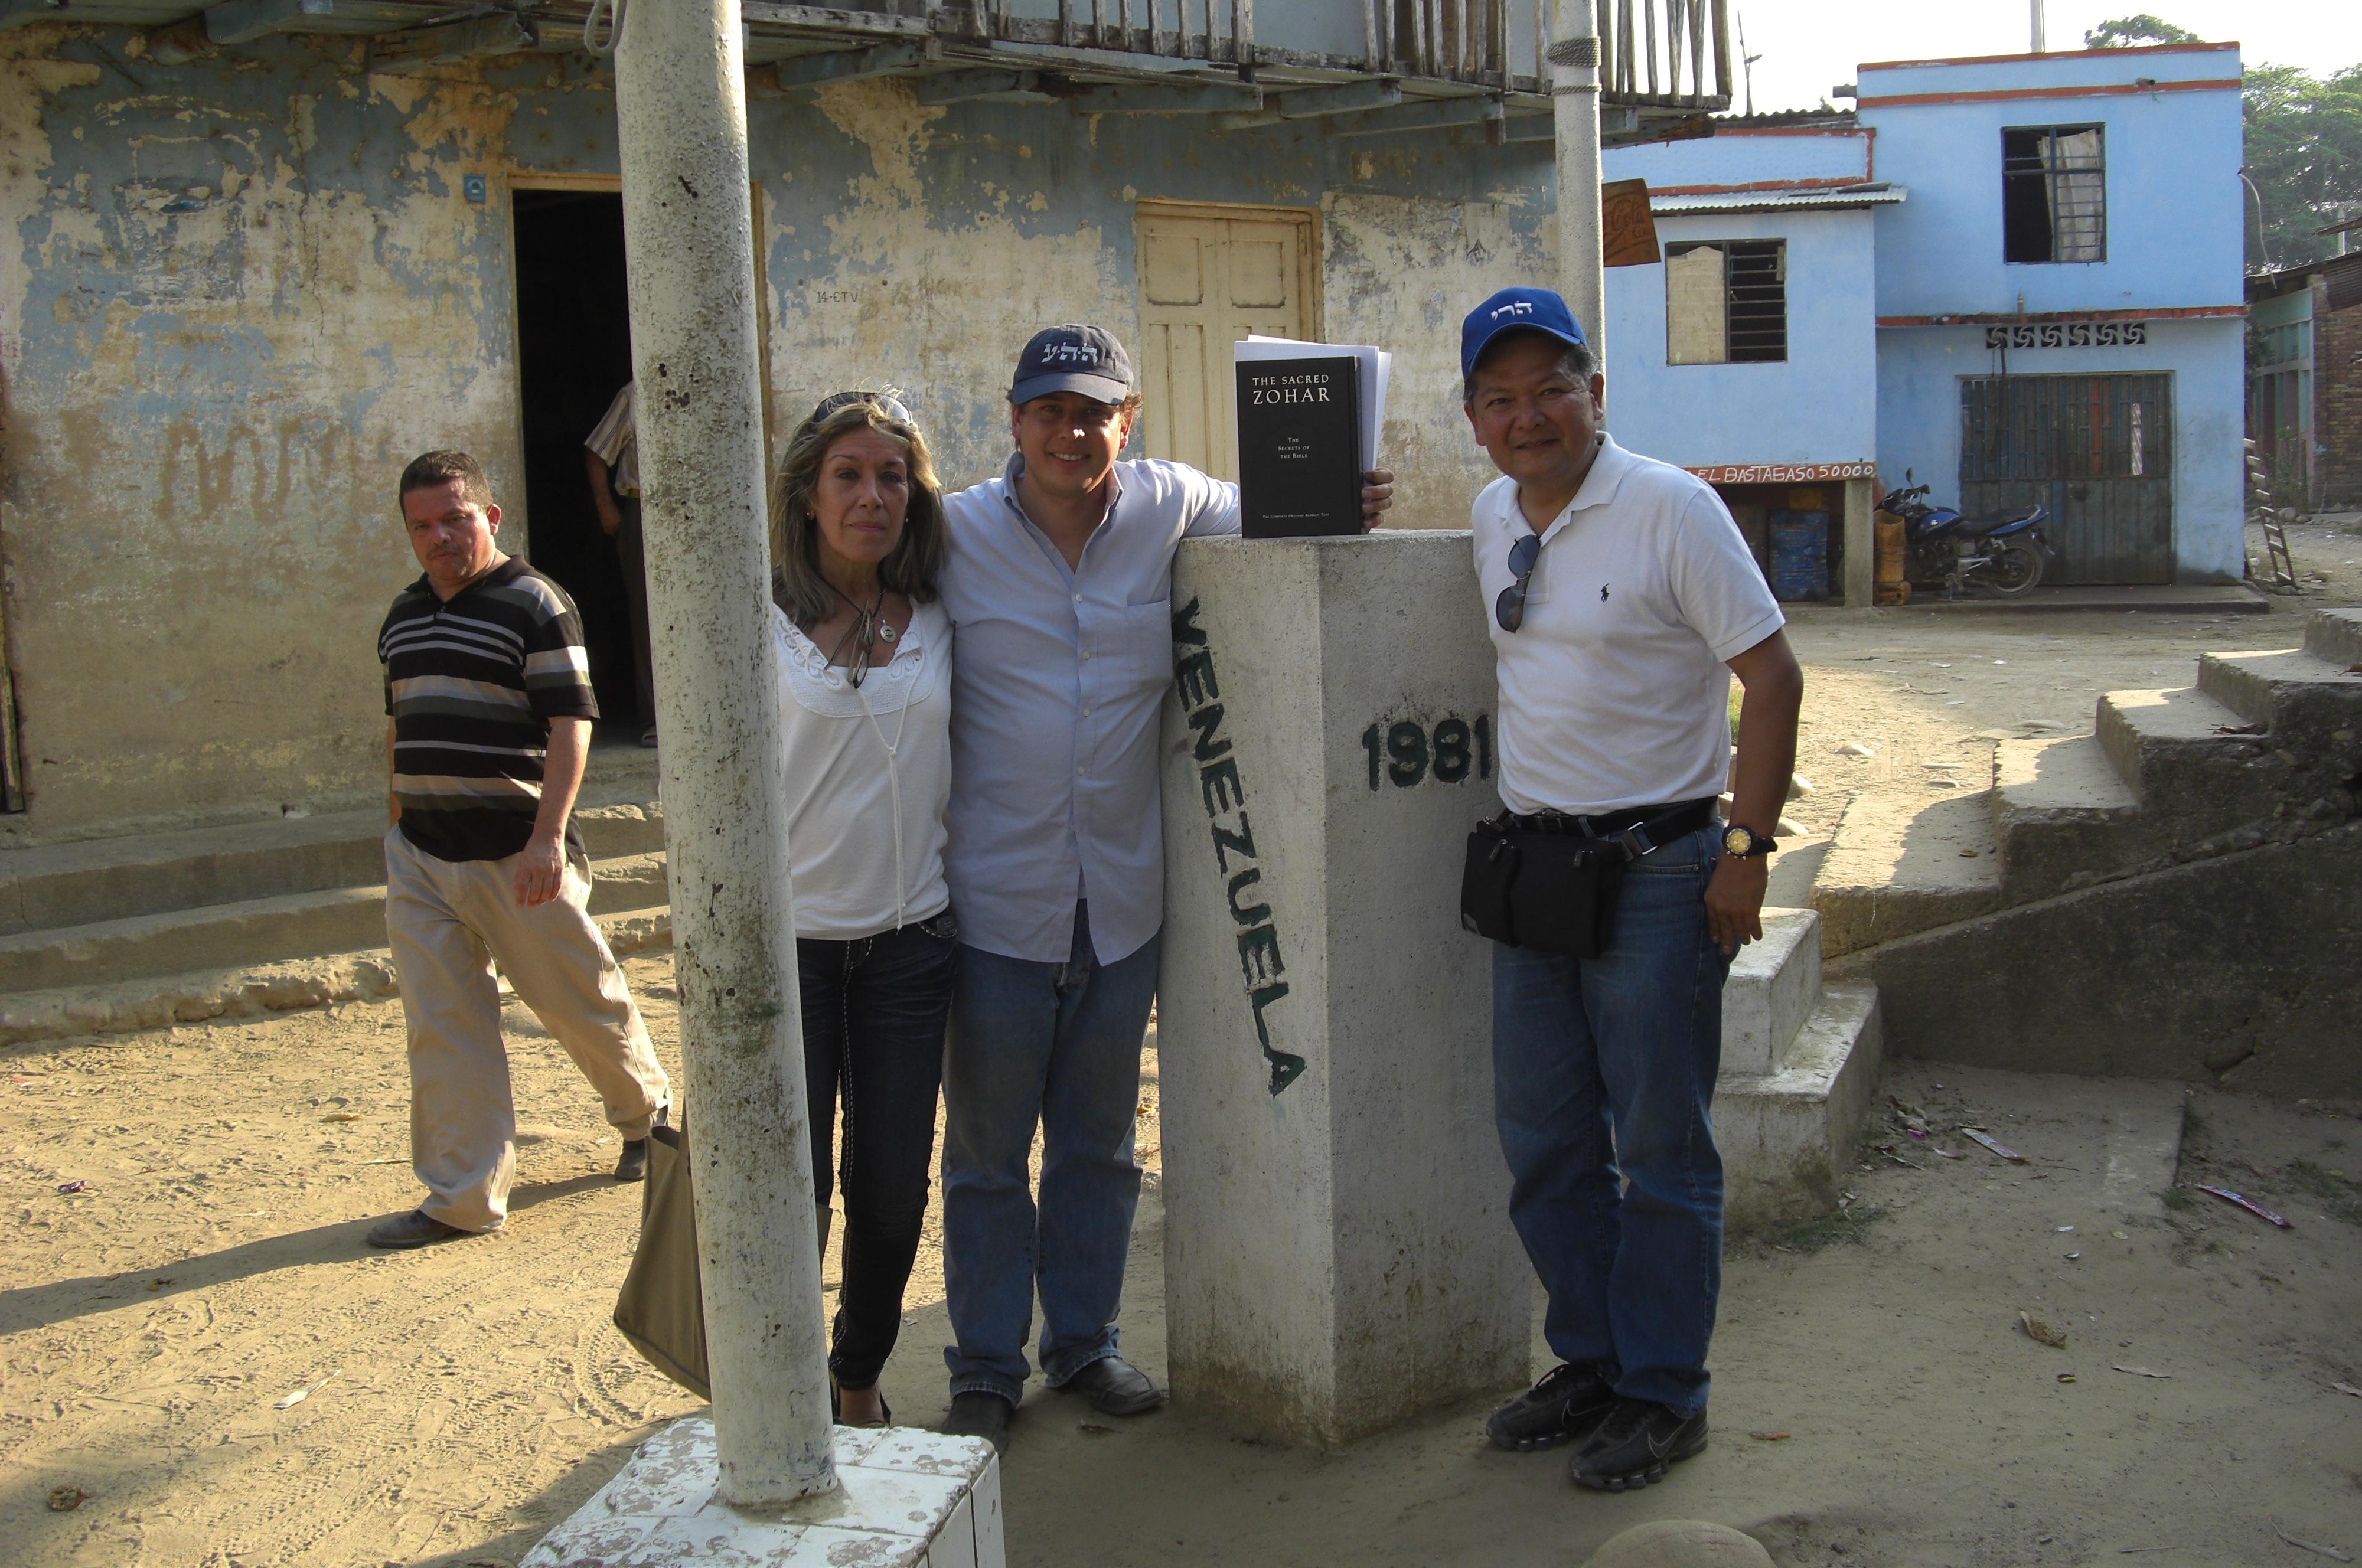 Kabbalah Centre volunteers pose near the Colombia/Venezuela border